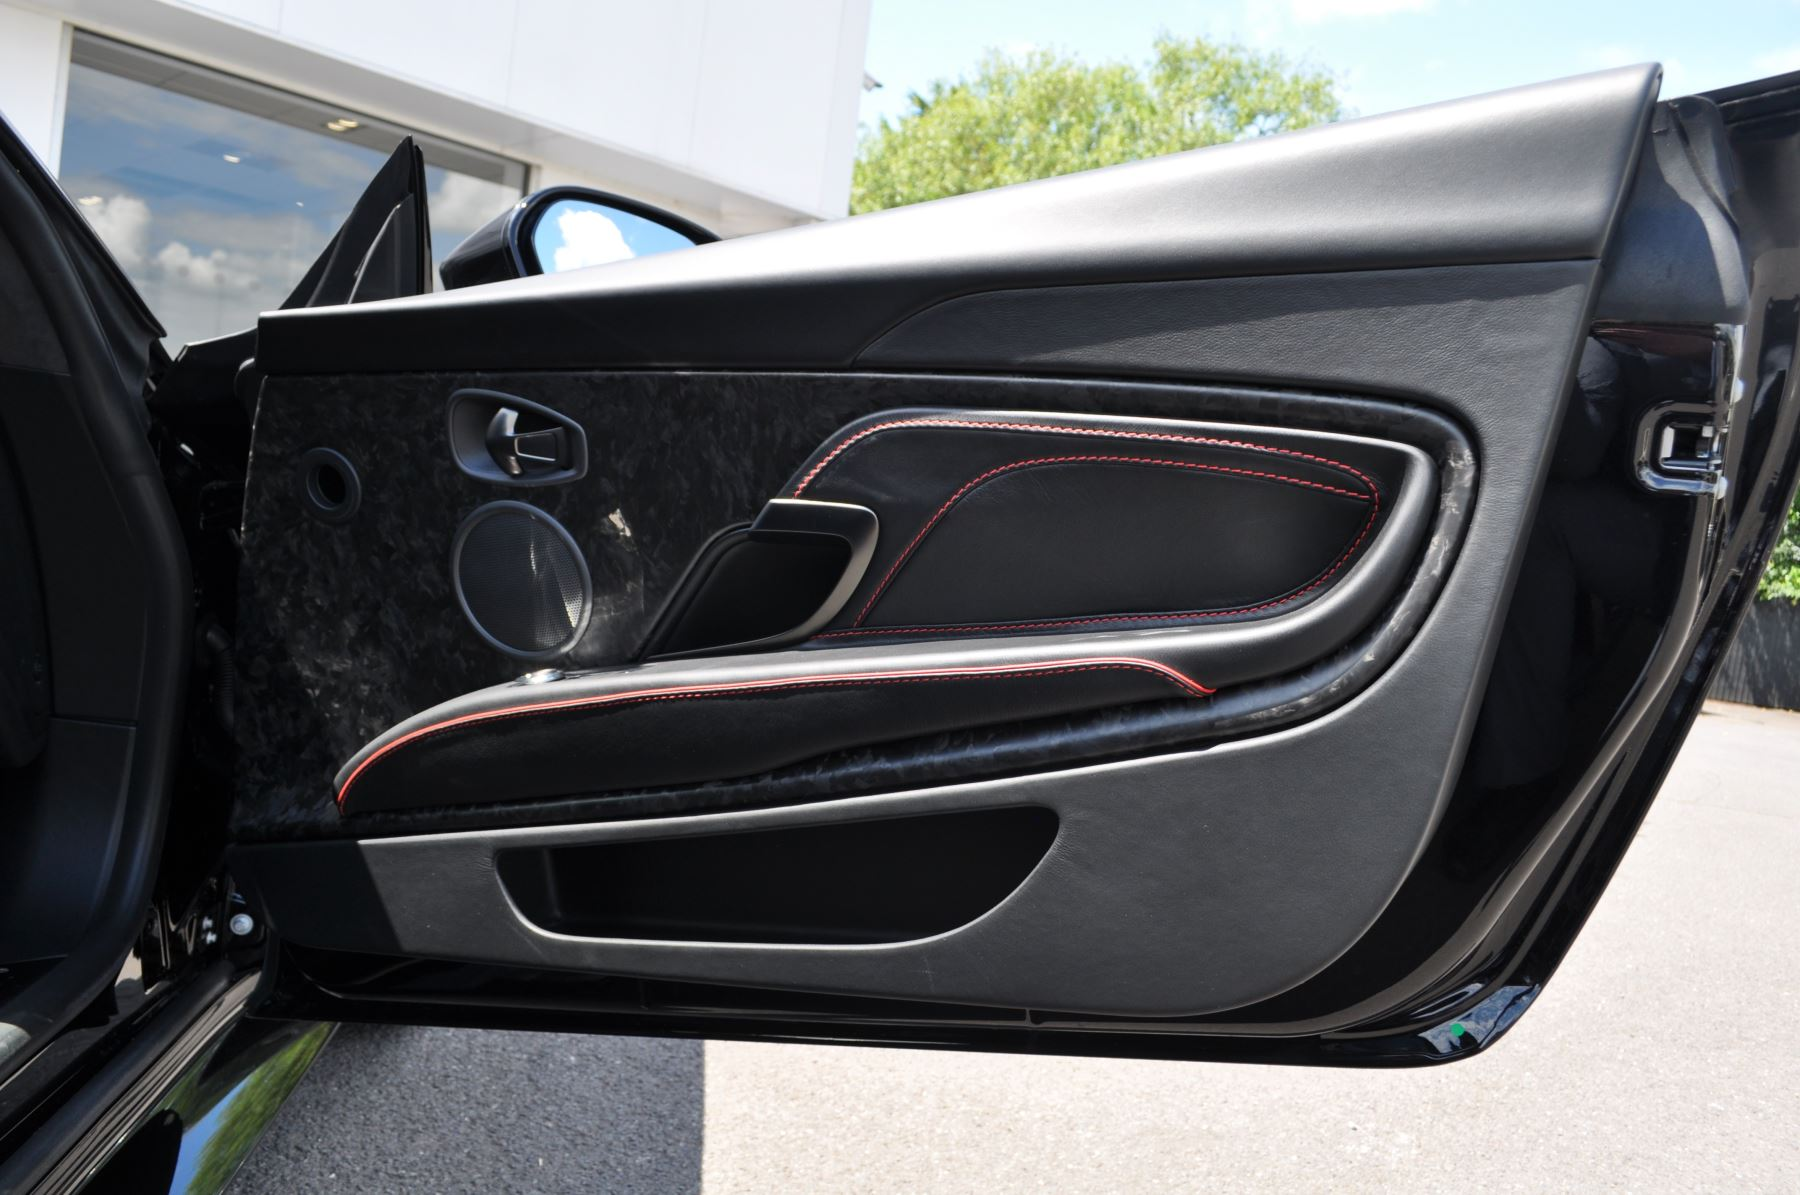 Aston Martin DBS V12 Superleggera Touchtronic image 17